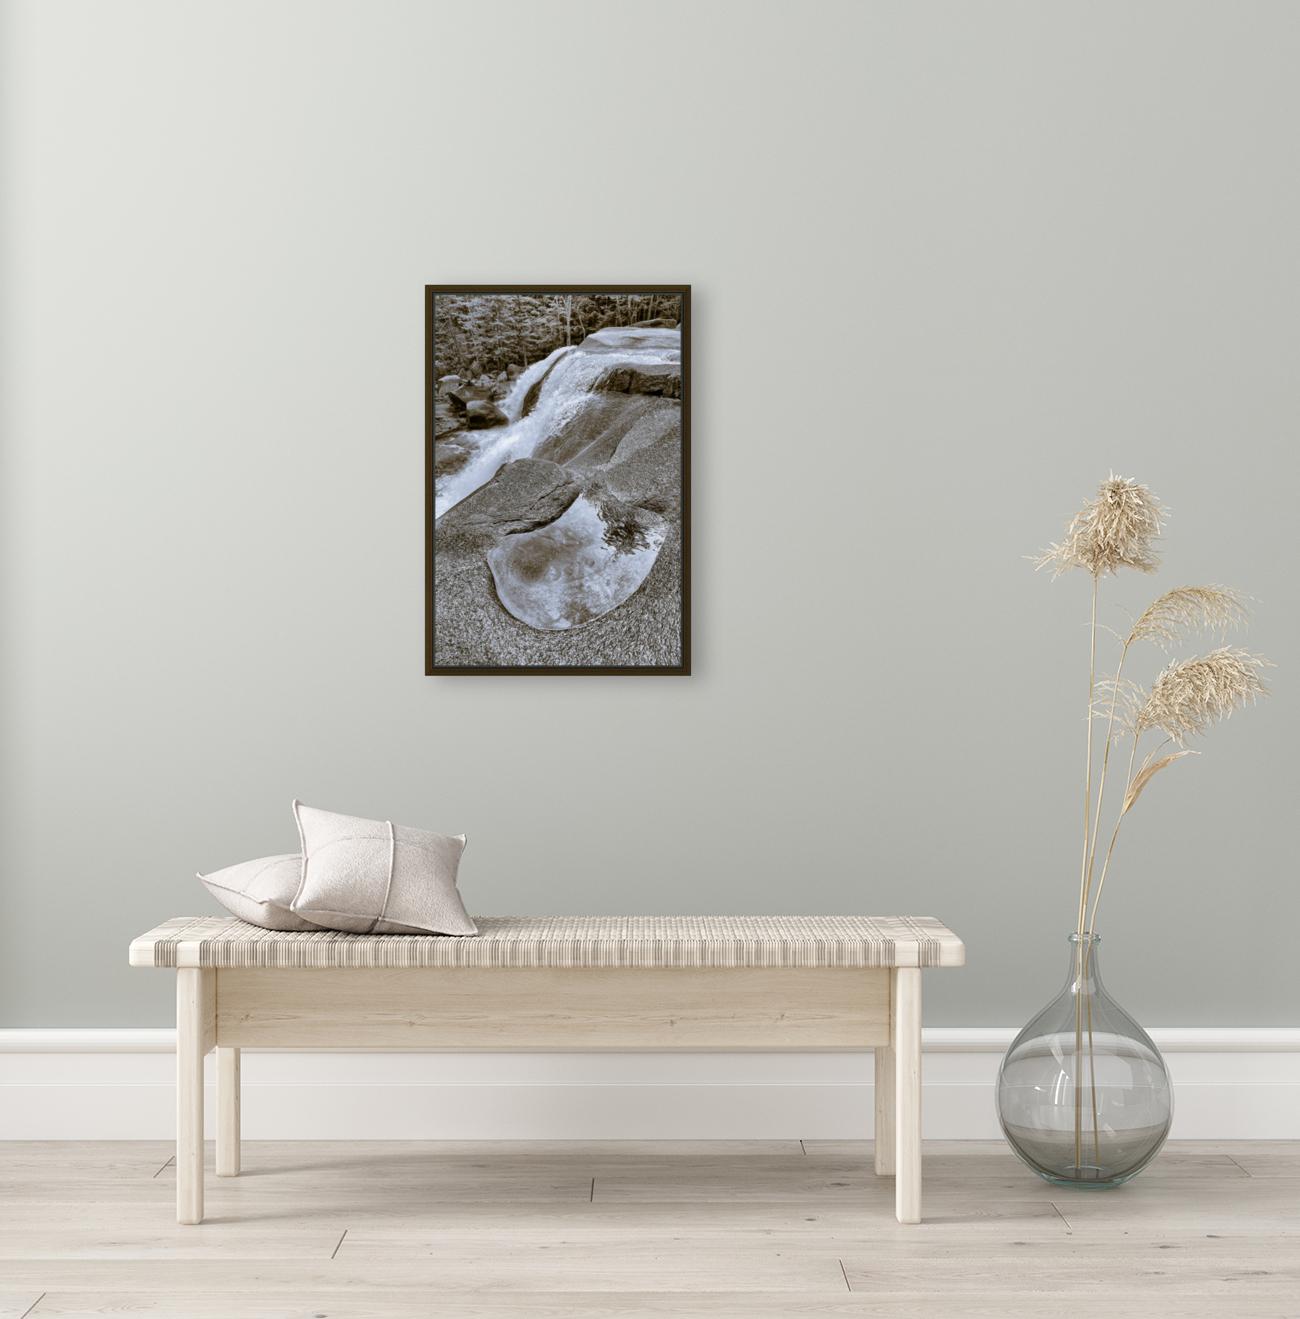 Waterfall ap 2212 B&W  Art